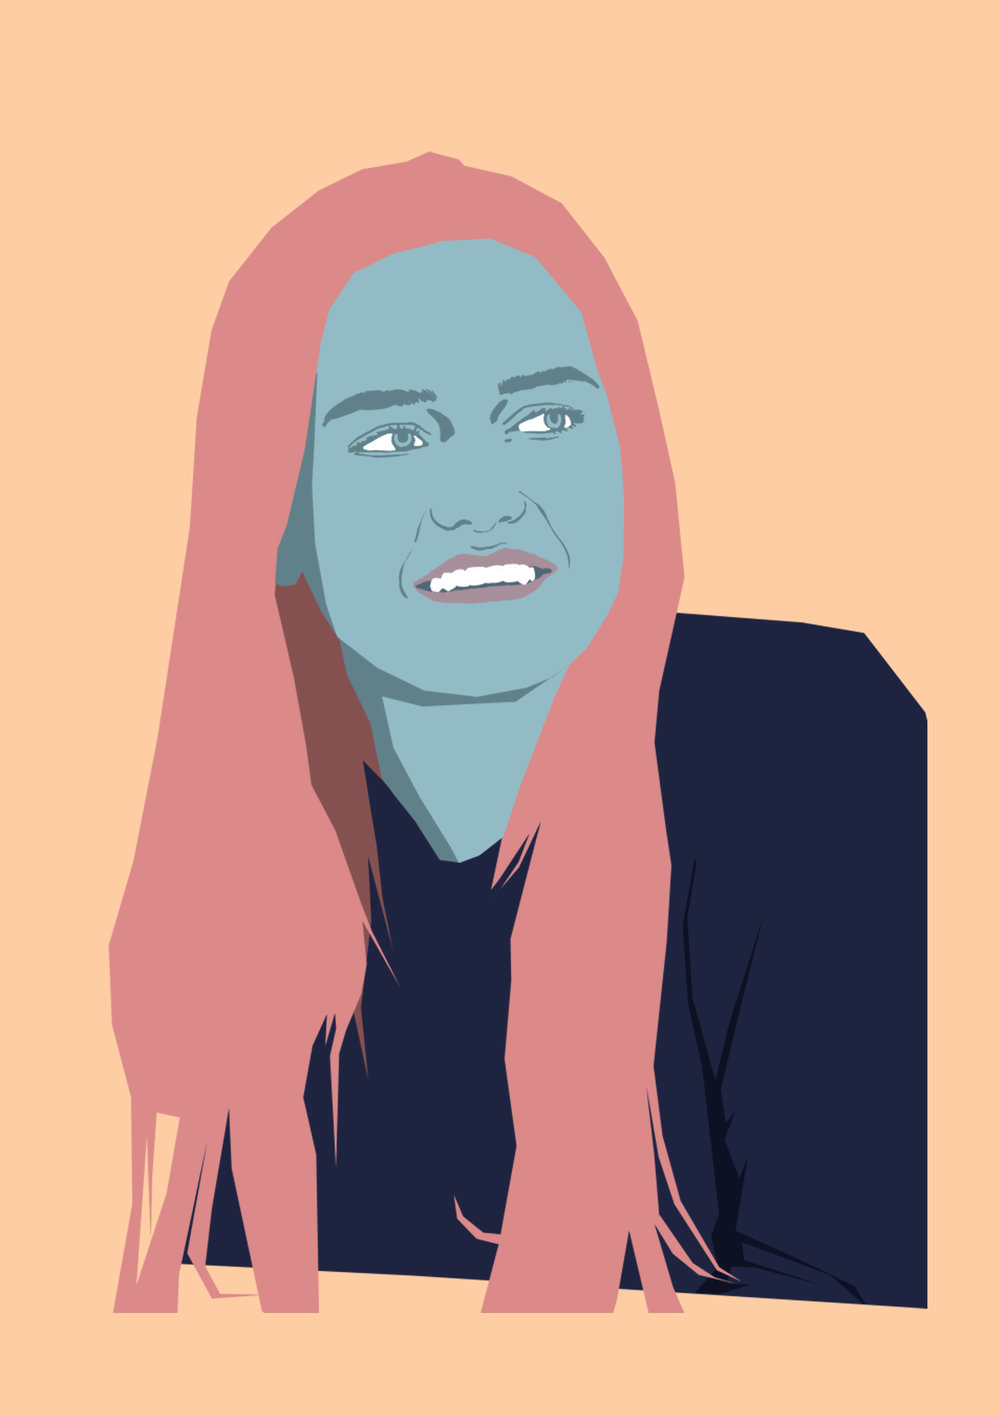 Emma renaudin - Conceptrice, Rédactrice@reno.emma